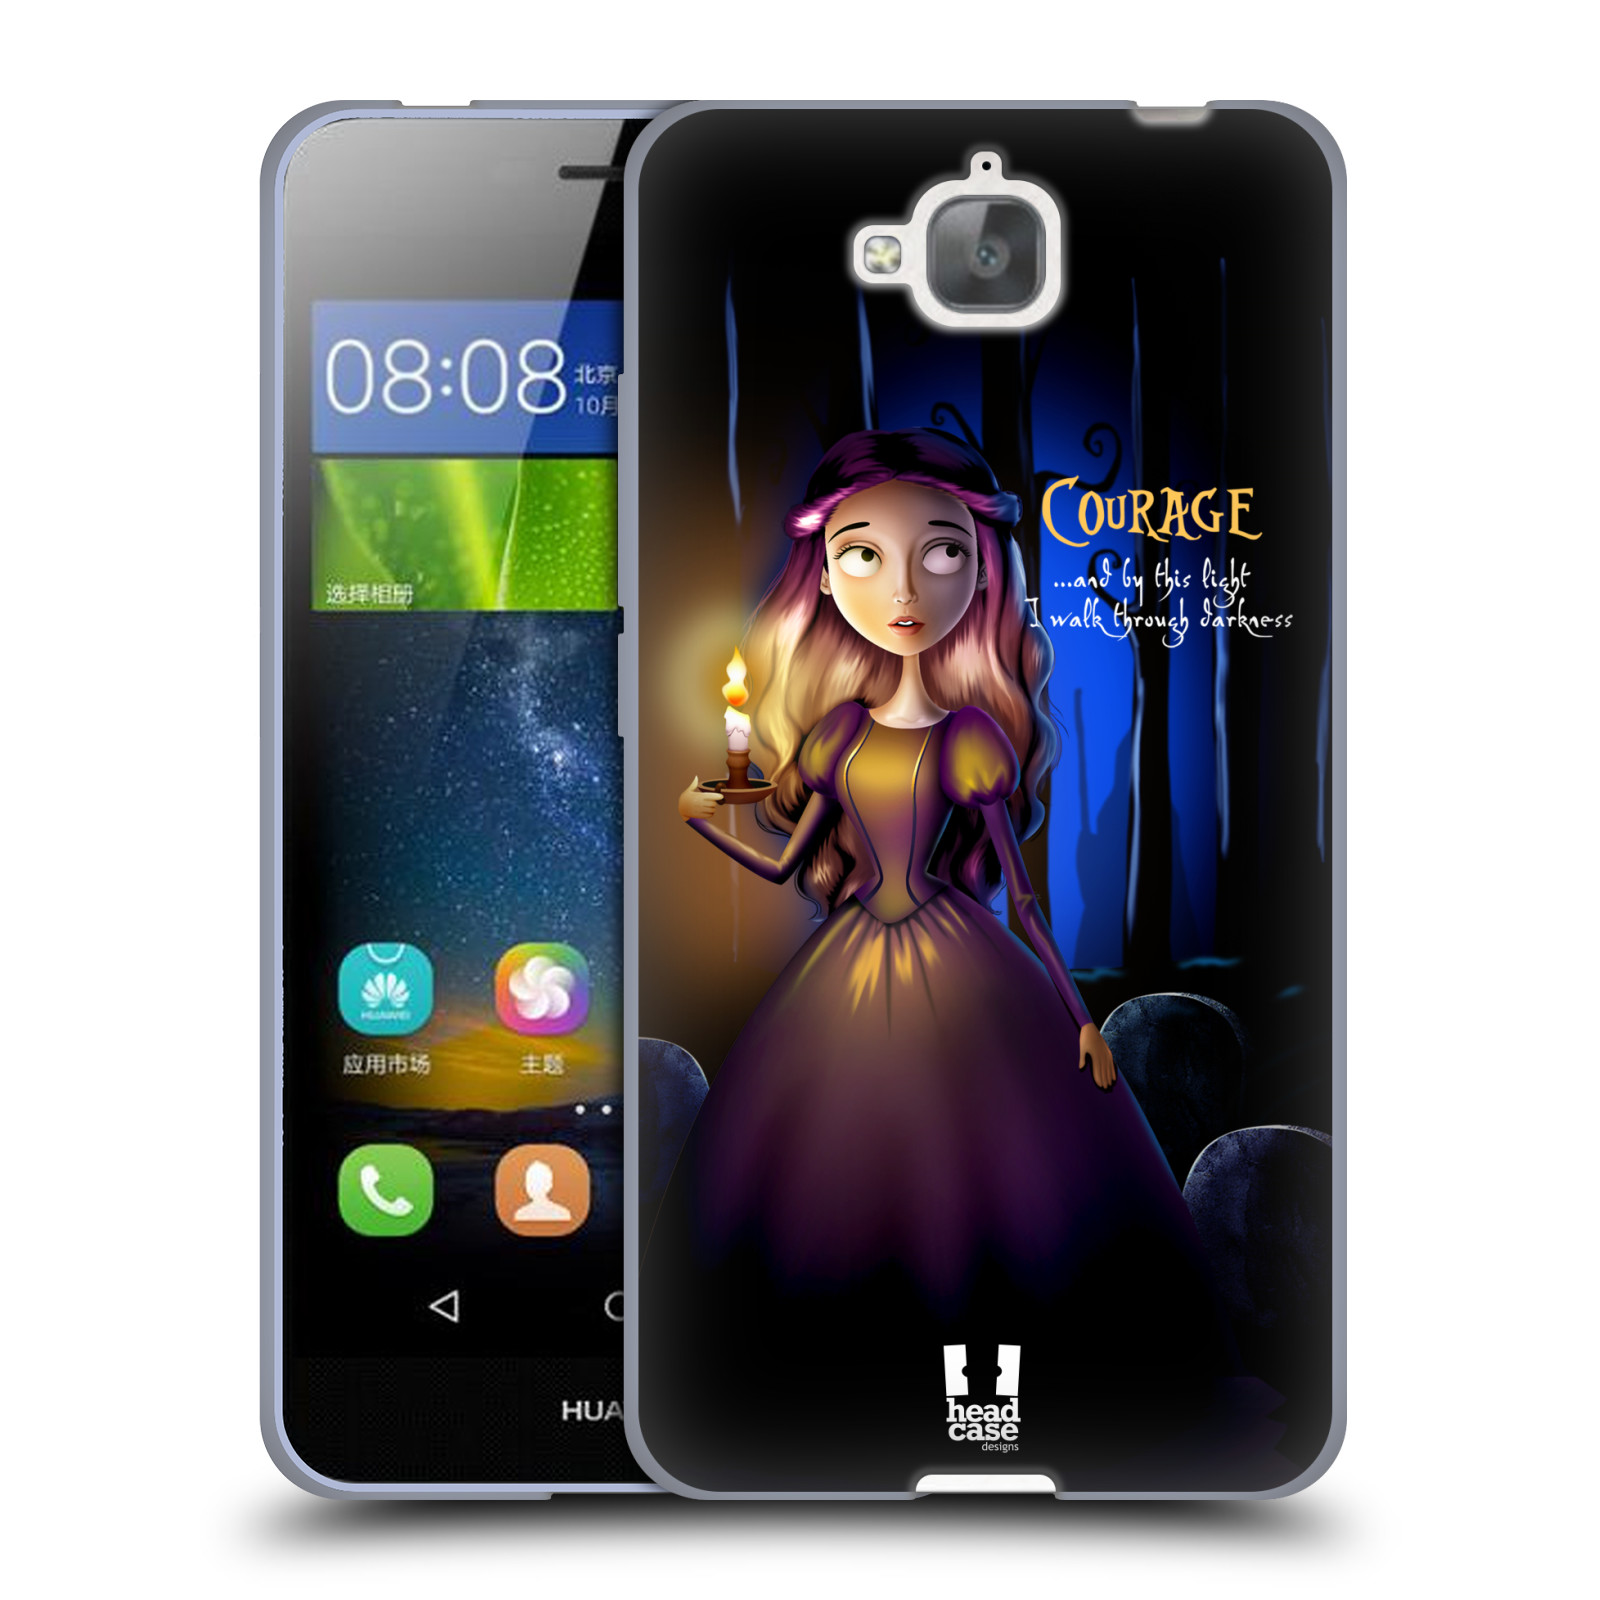 Silikonové pouzdro na mobil Huawei Y6 Pro Dual Sim HEAD CASE MACABRE COURAGE